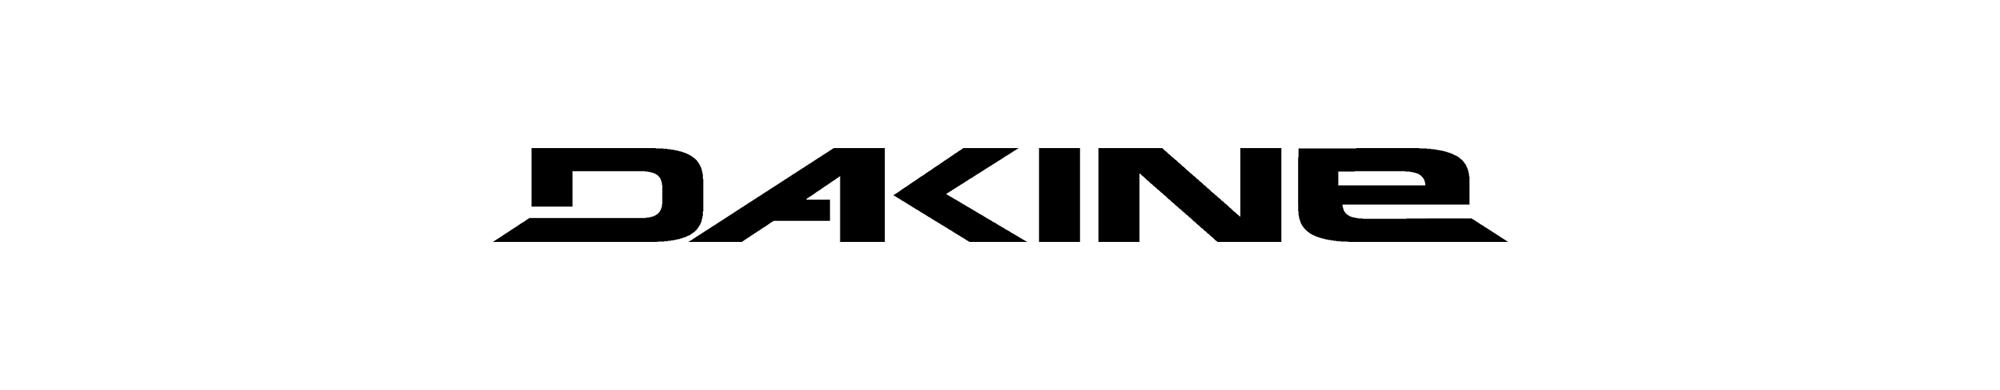 Dakine.png